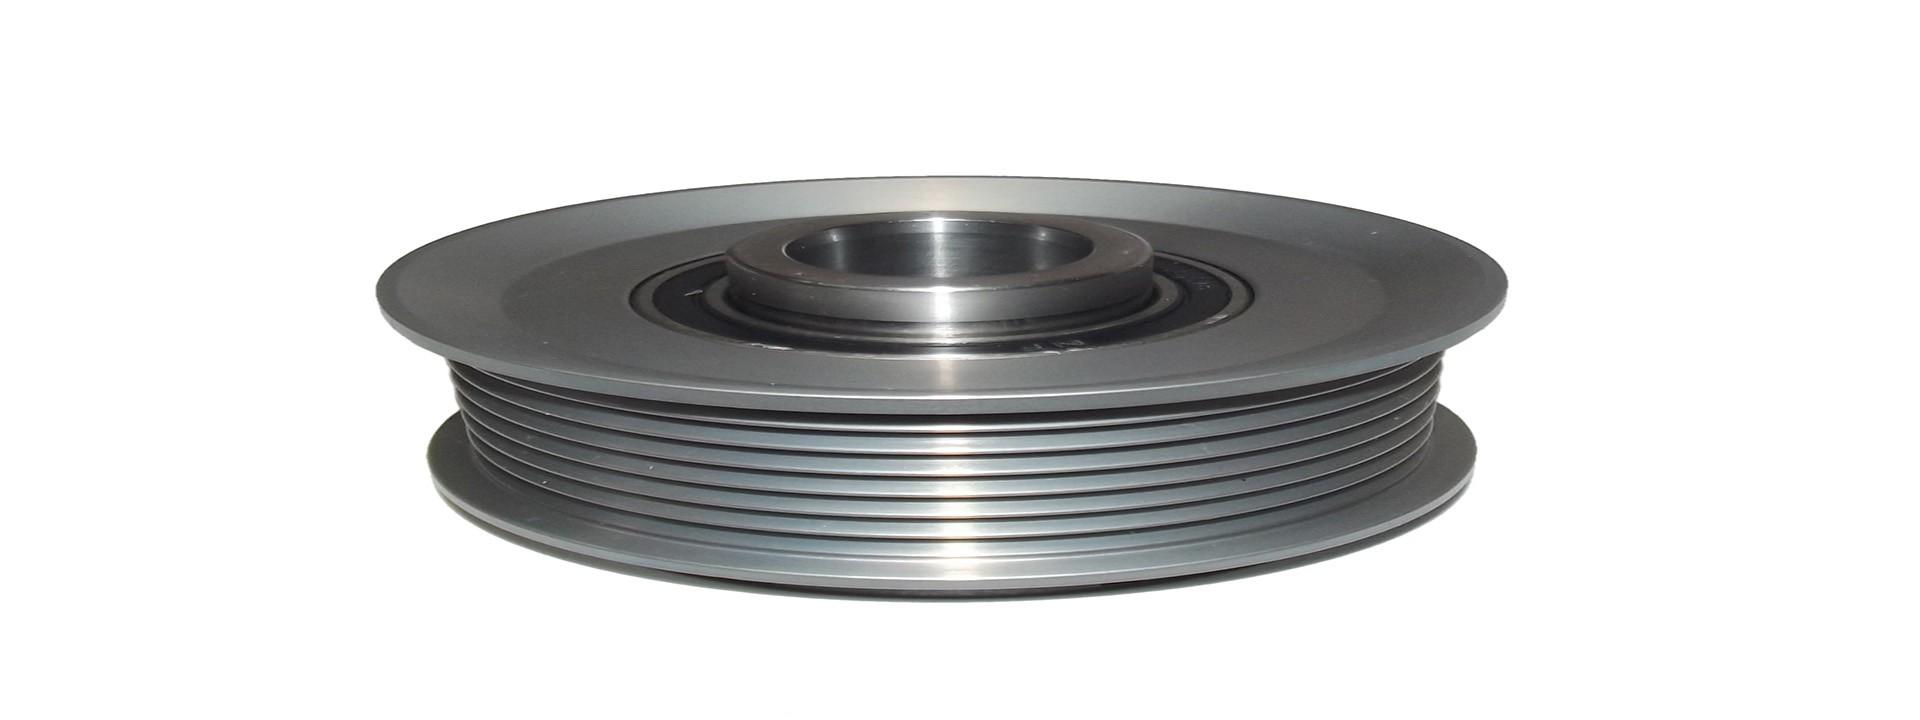 d784f975437a89443d5e9c159b8a - Шкив привода генератора